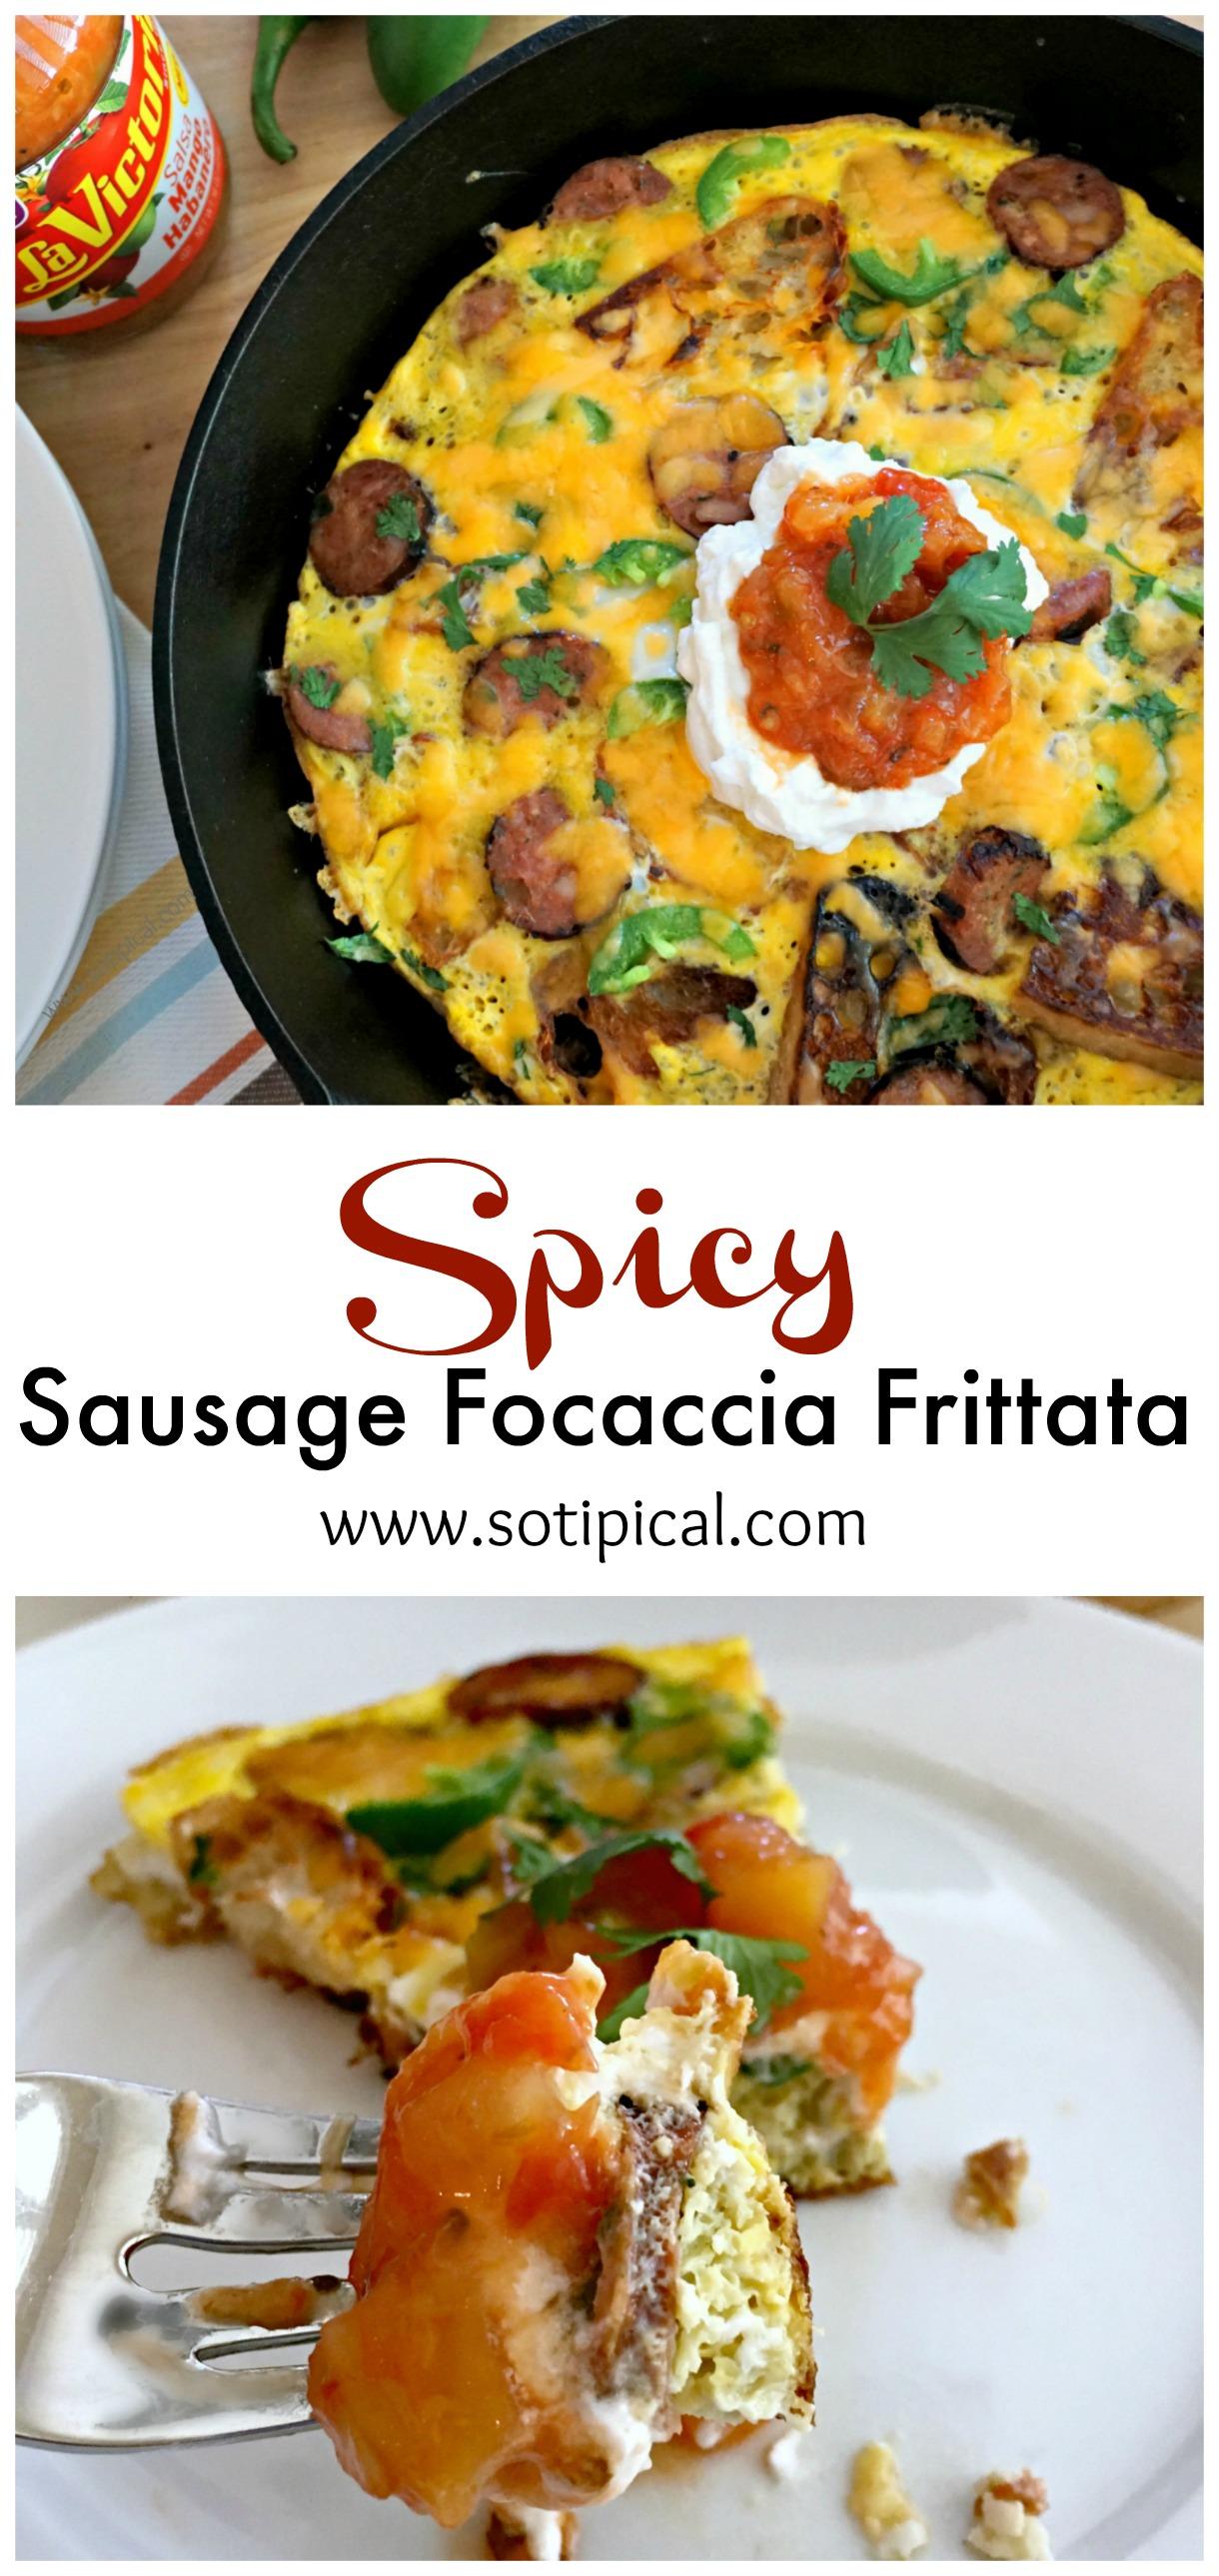 spicy sausage focaccia frittata pin